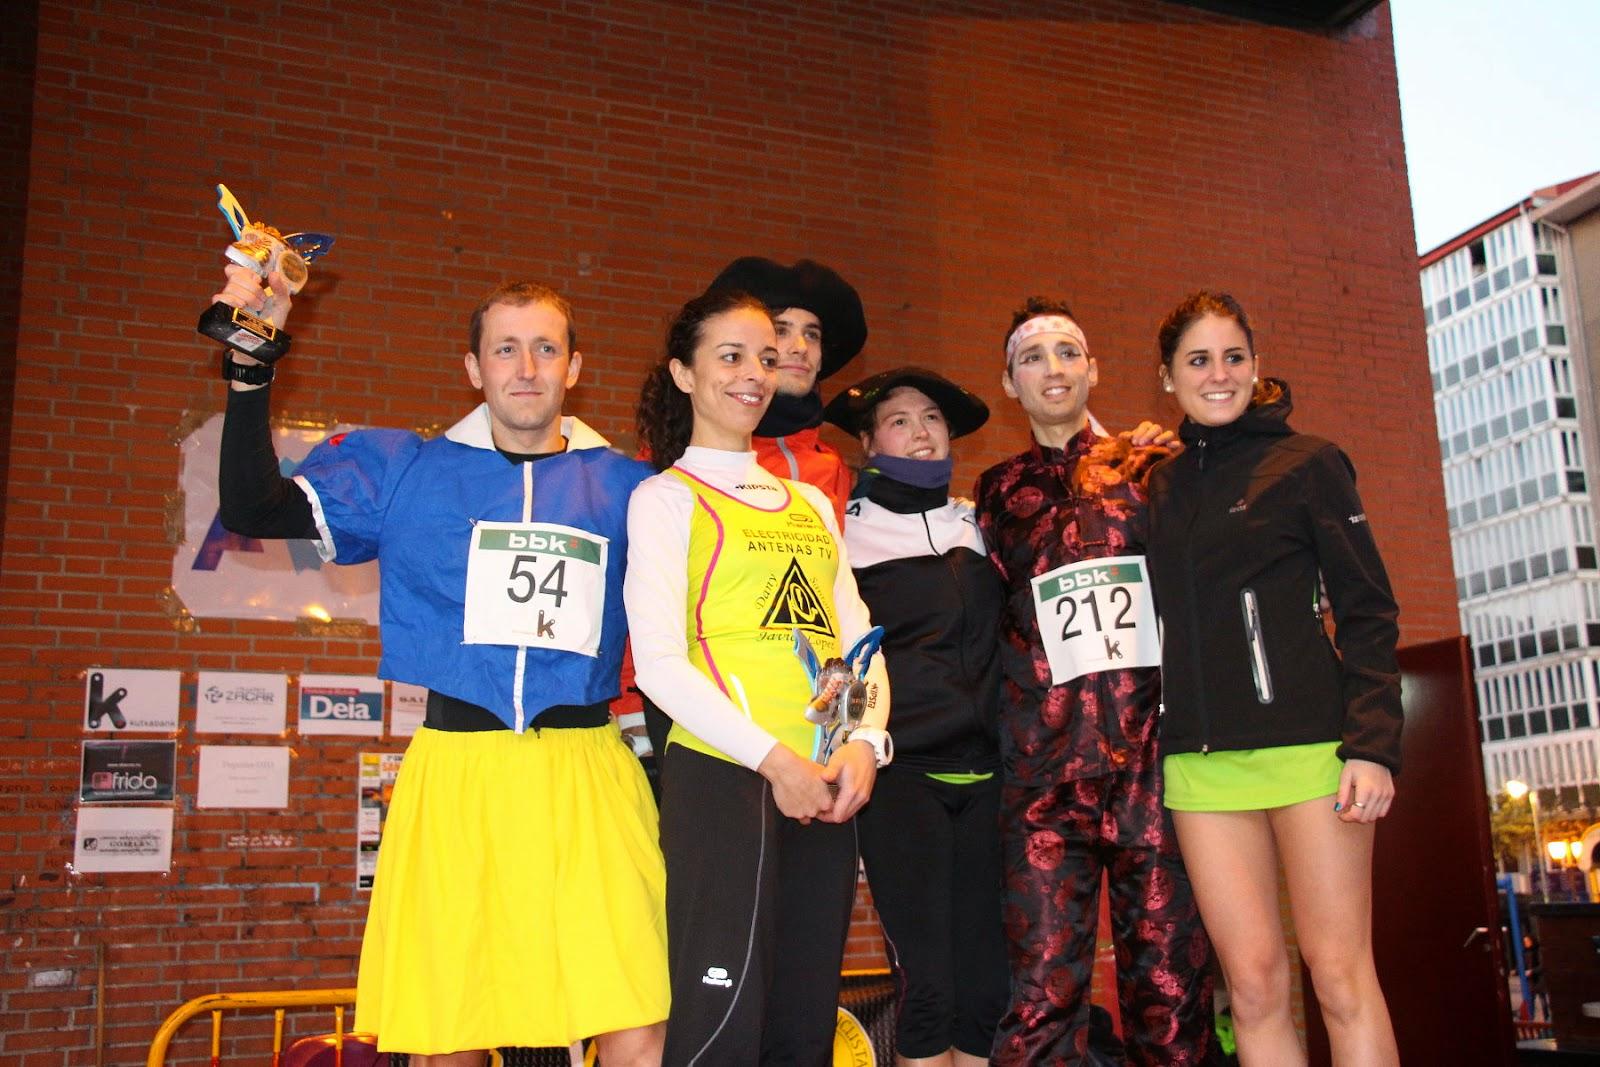 La barakaldesa Belit Solar y el santurtziarra Iker Velasco ganan la carrera San Silvestre